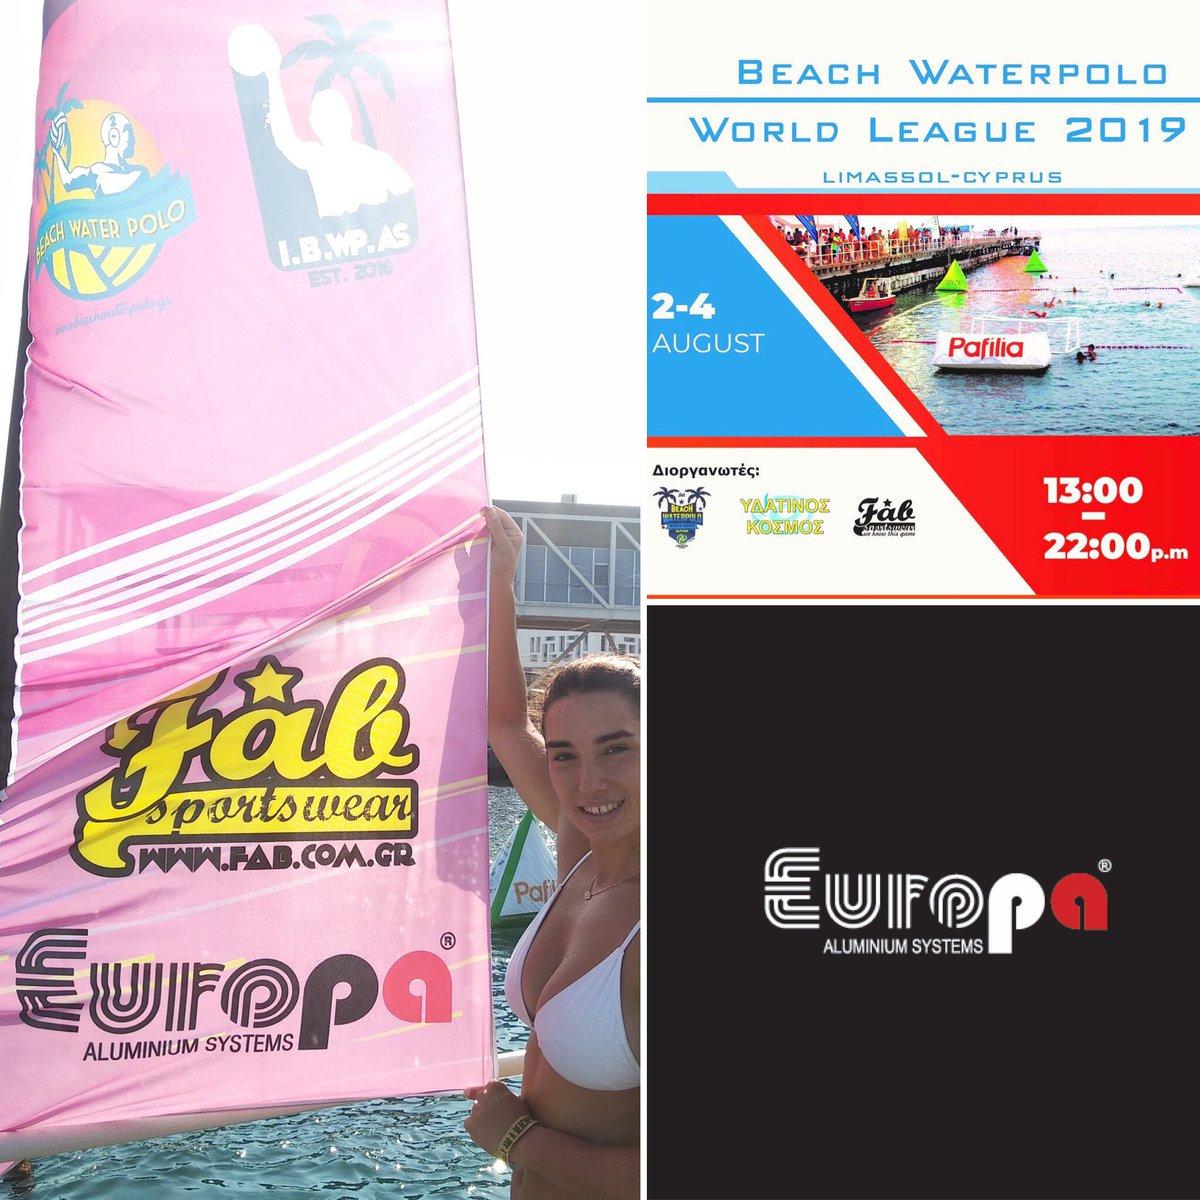 @EuropaProfil #live από το διεθνές 🌐 #beachwaterpoloworldleague #Limassol Night Edition 2019 📅 του International Beach #WaterPolo Association🤽 Σήμερα ο μεγάλος τελικός @ 21:15! ⭐️ #EuropaWins #Λεμεσός / #Κύπρος 🇨🇾 #beachpolistas #EuropaProfil😎 #BeachWaterpolo #Cyprus https://t.co/z5wf4UtIQs